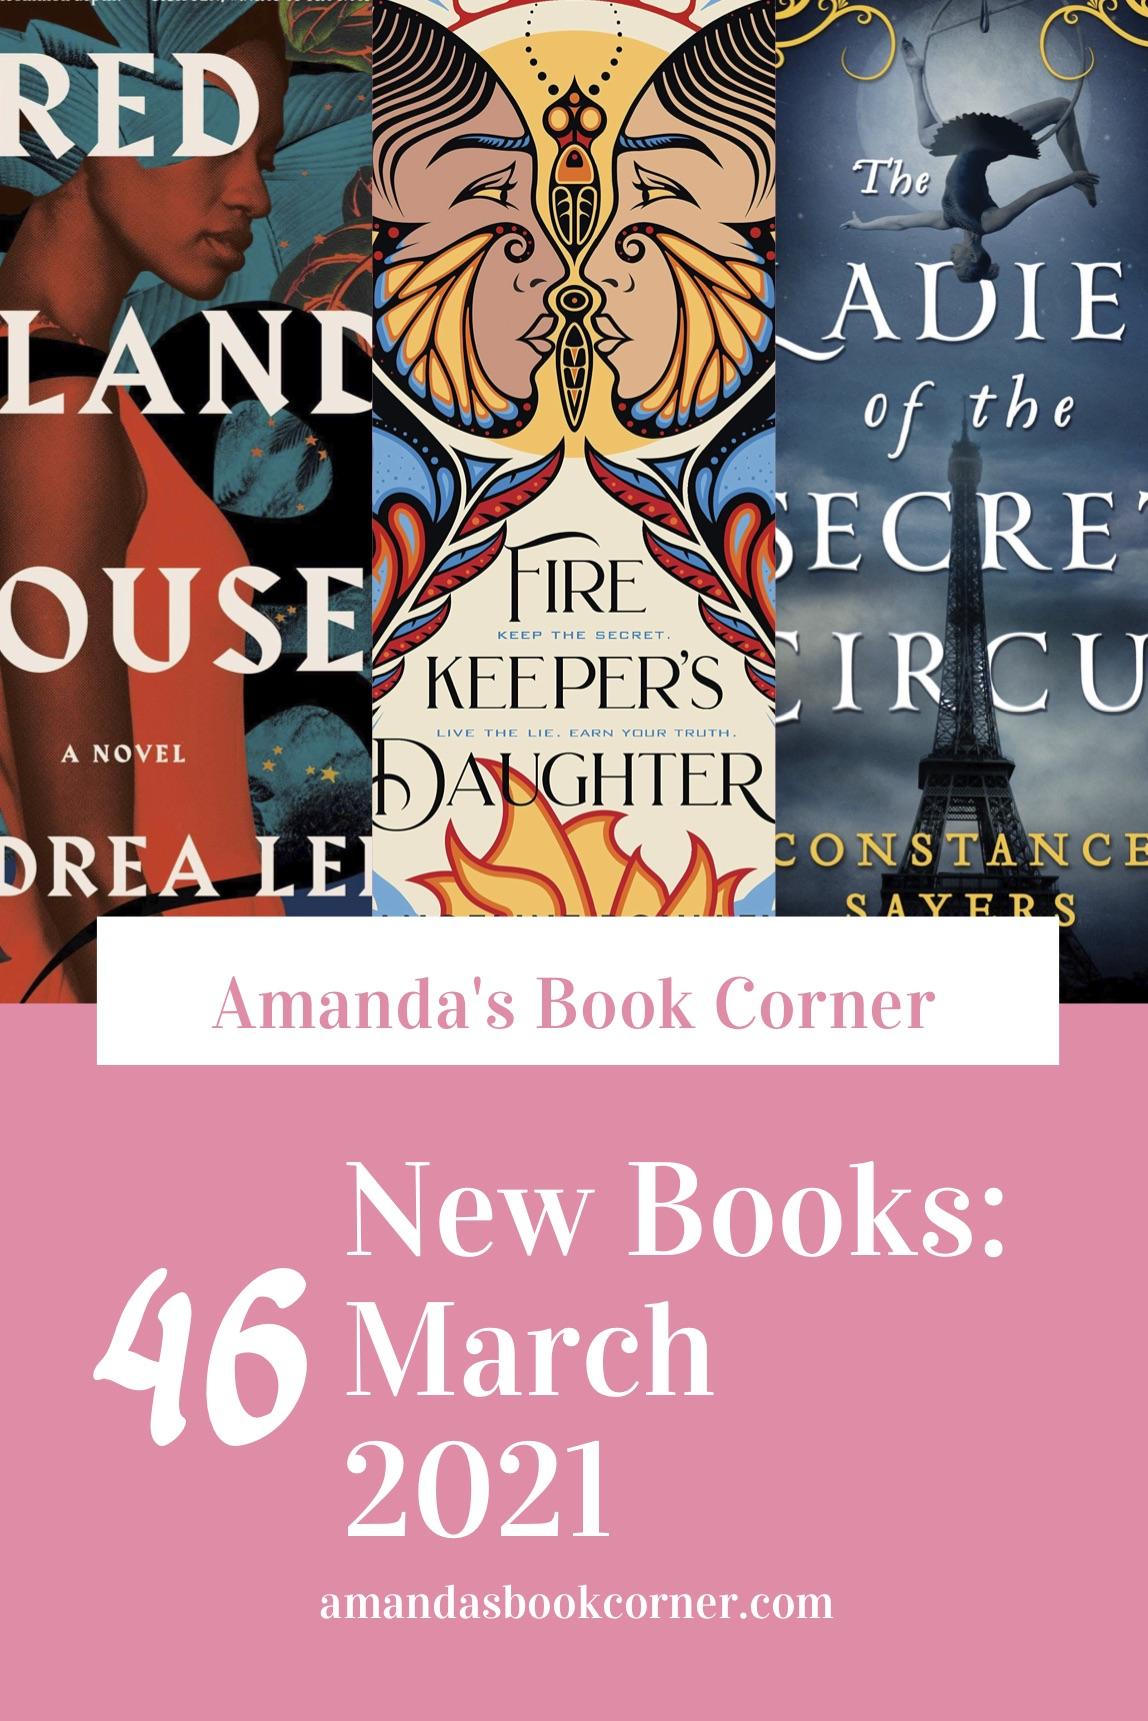 New Books - March 2021